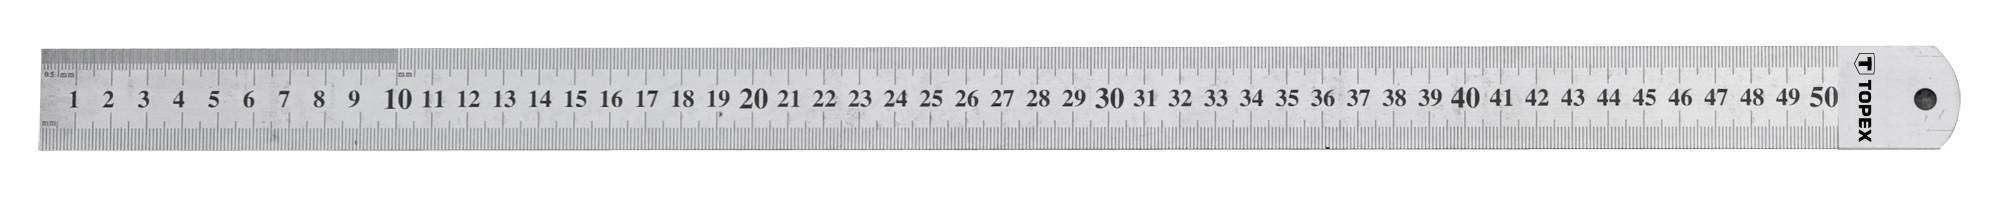 Acélvonalzó 500 mm rozsdamentes | TOPEX 31C050